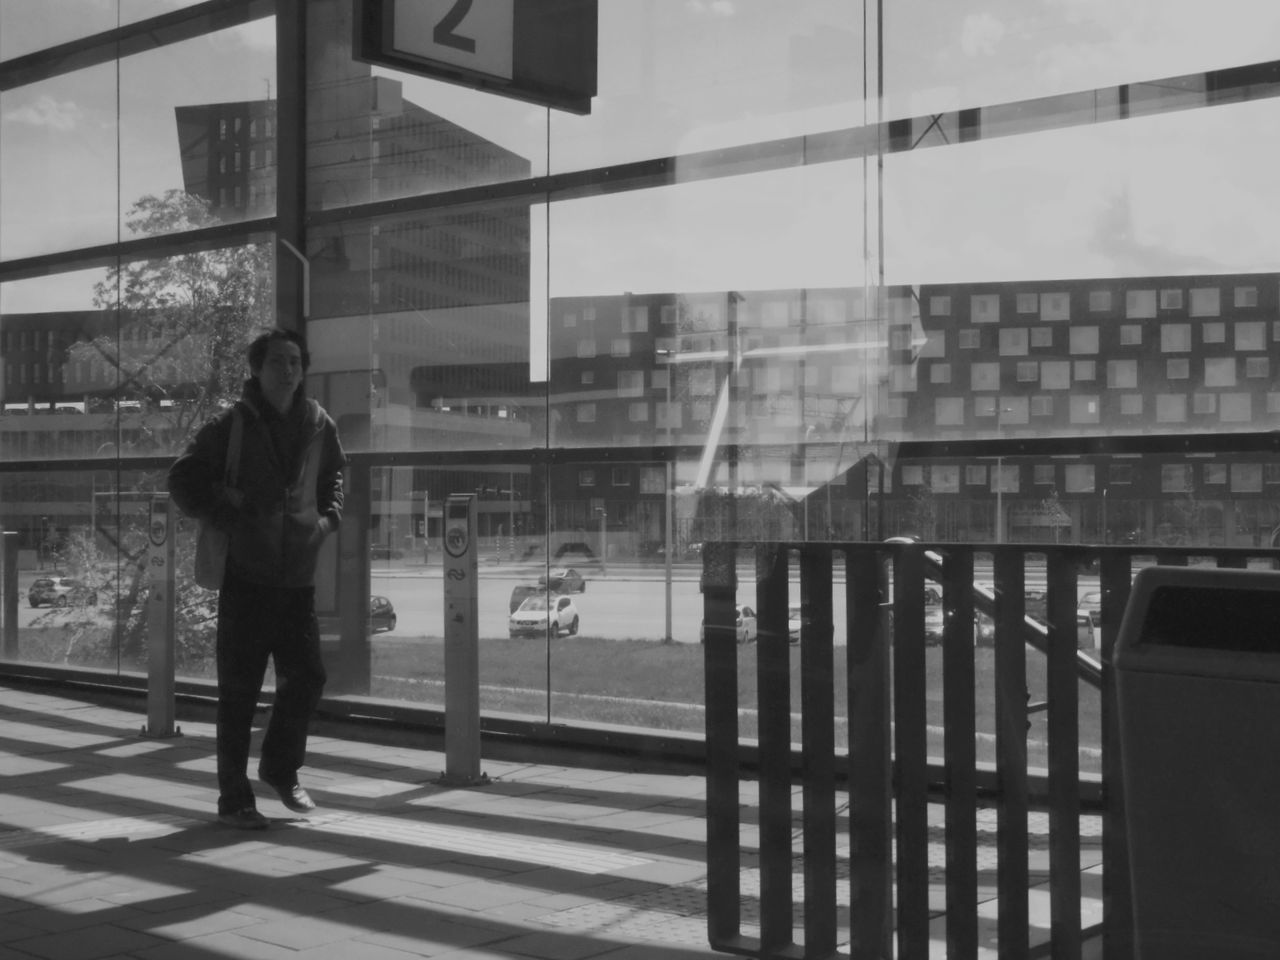 Running Late Public Transportation Streetphotography The Traveler - 2015 EyeEm Awards Light And Shadow Blackandwhite Creative Light And Shadow